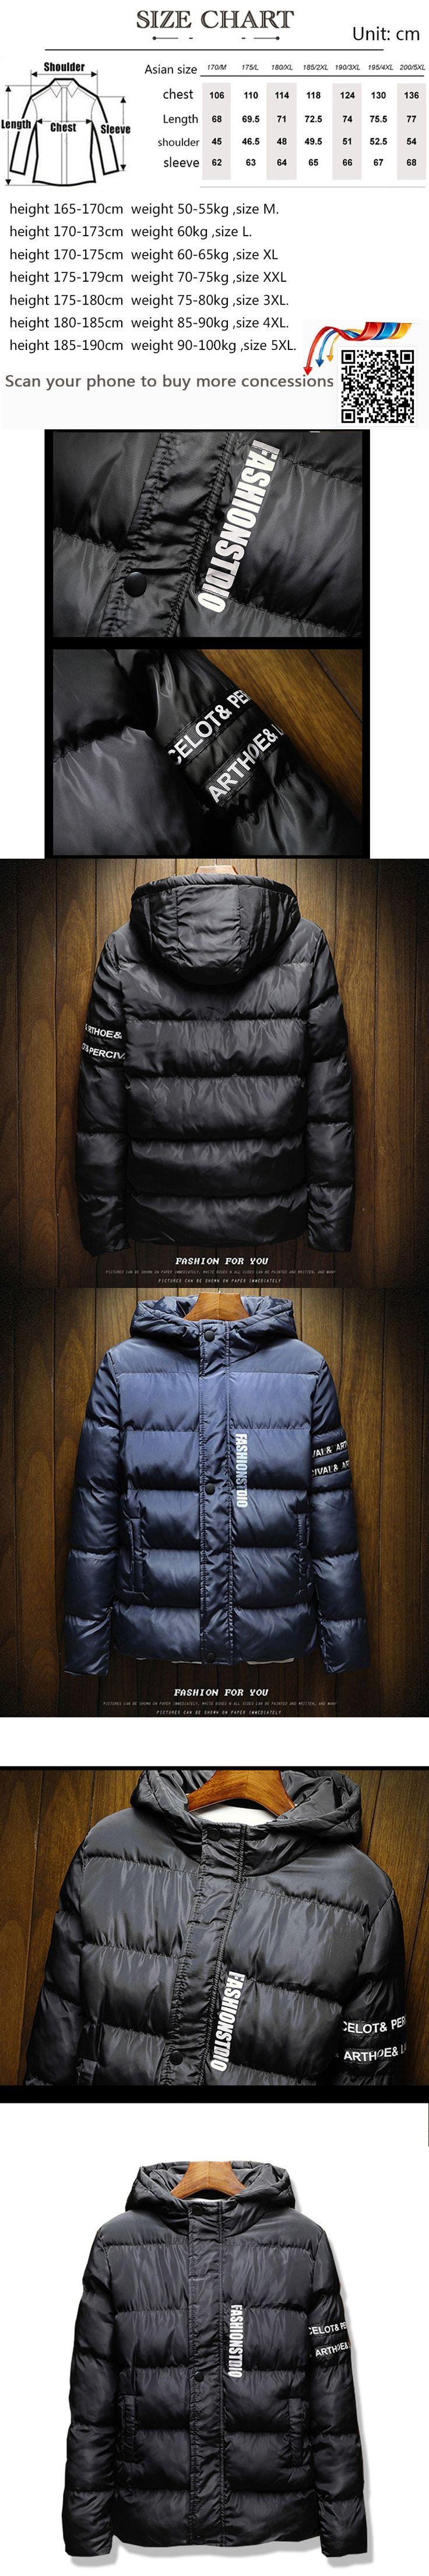 Men Jacket Fashion Jacket Men Hooded Winter Warm Cotton Jacket Male Parka Printed letters Coat Men Large size Coat black blue